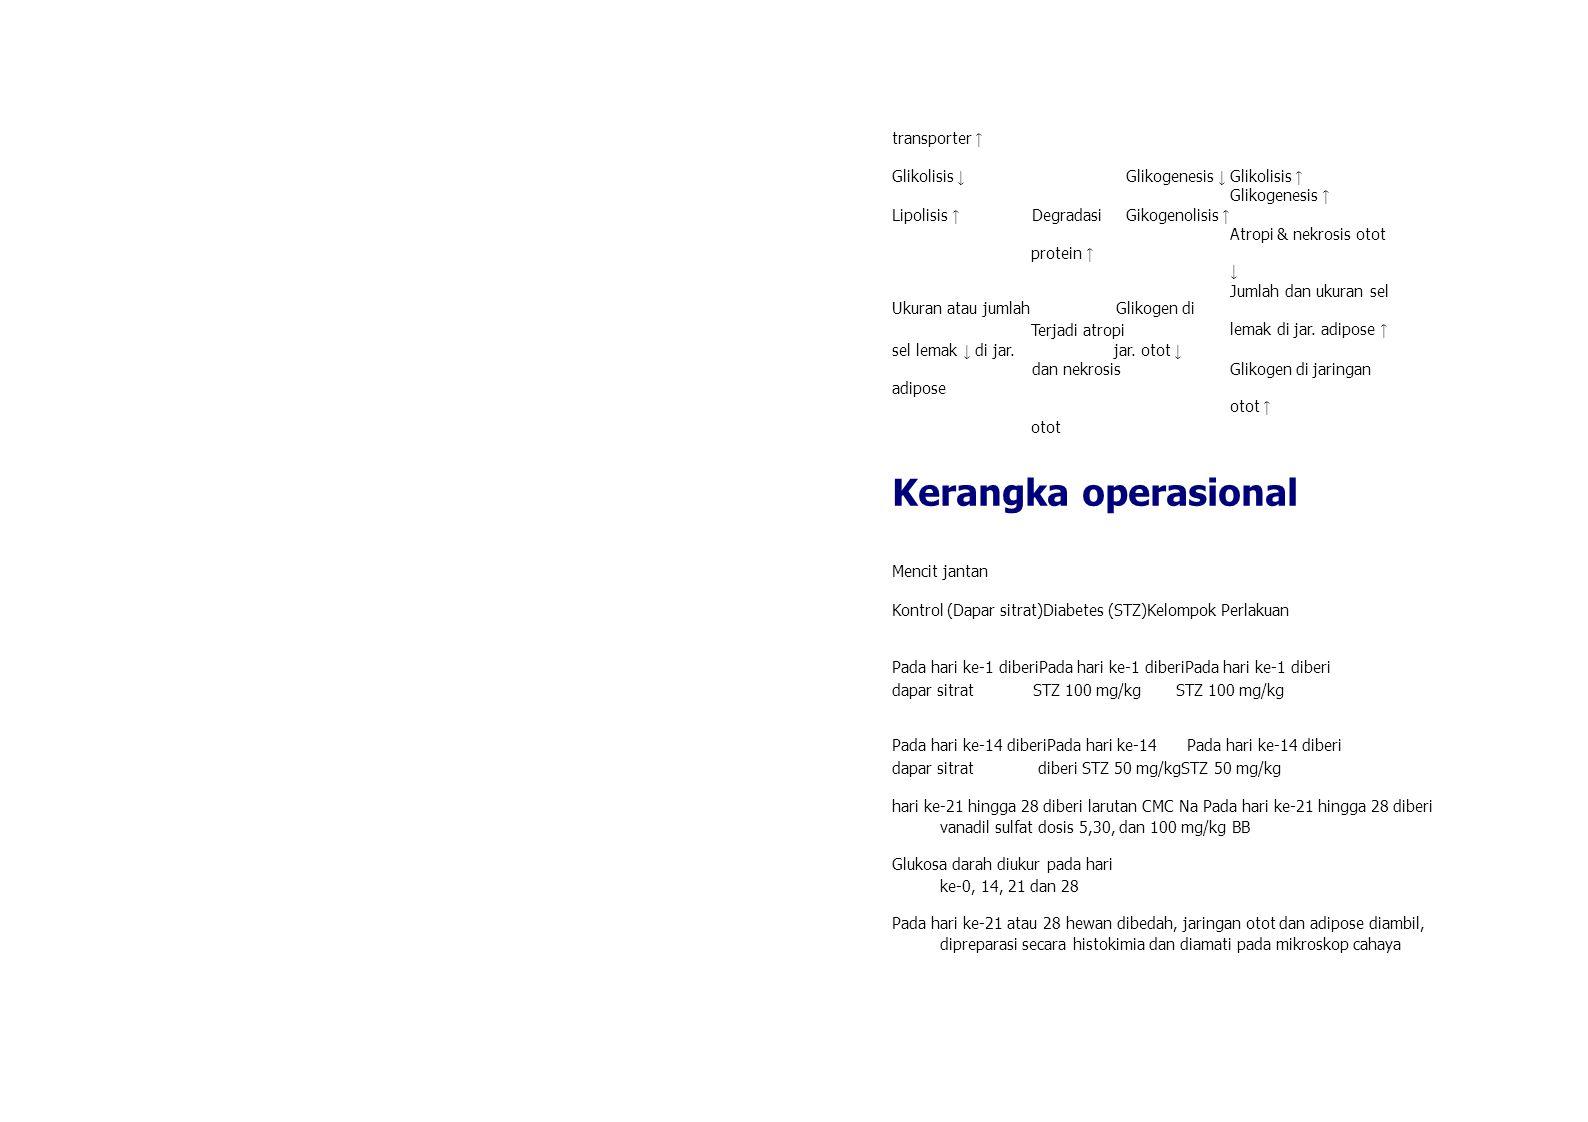 transporter ↑ Glikolisis ↓ Glikogenesis ↓ Glikolisis ↑ Glikogenesis ↑ Lipolisis ↑ Degradasi Gikogenolisis ↑ Atropi & nekrosis otot ↓ Jumlah dan ukuran